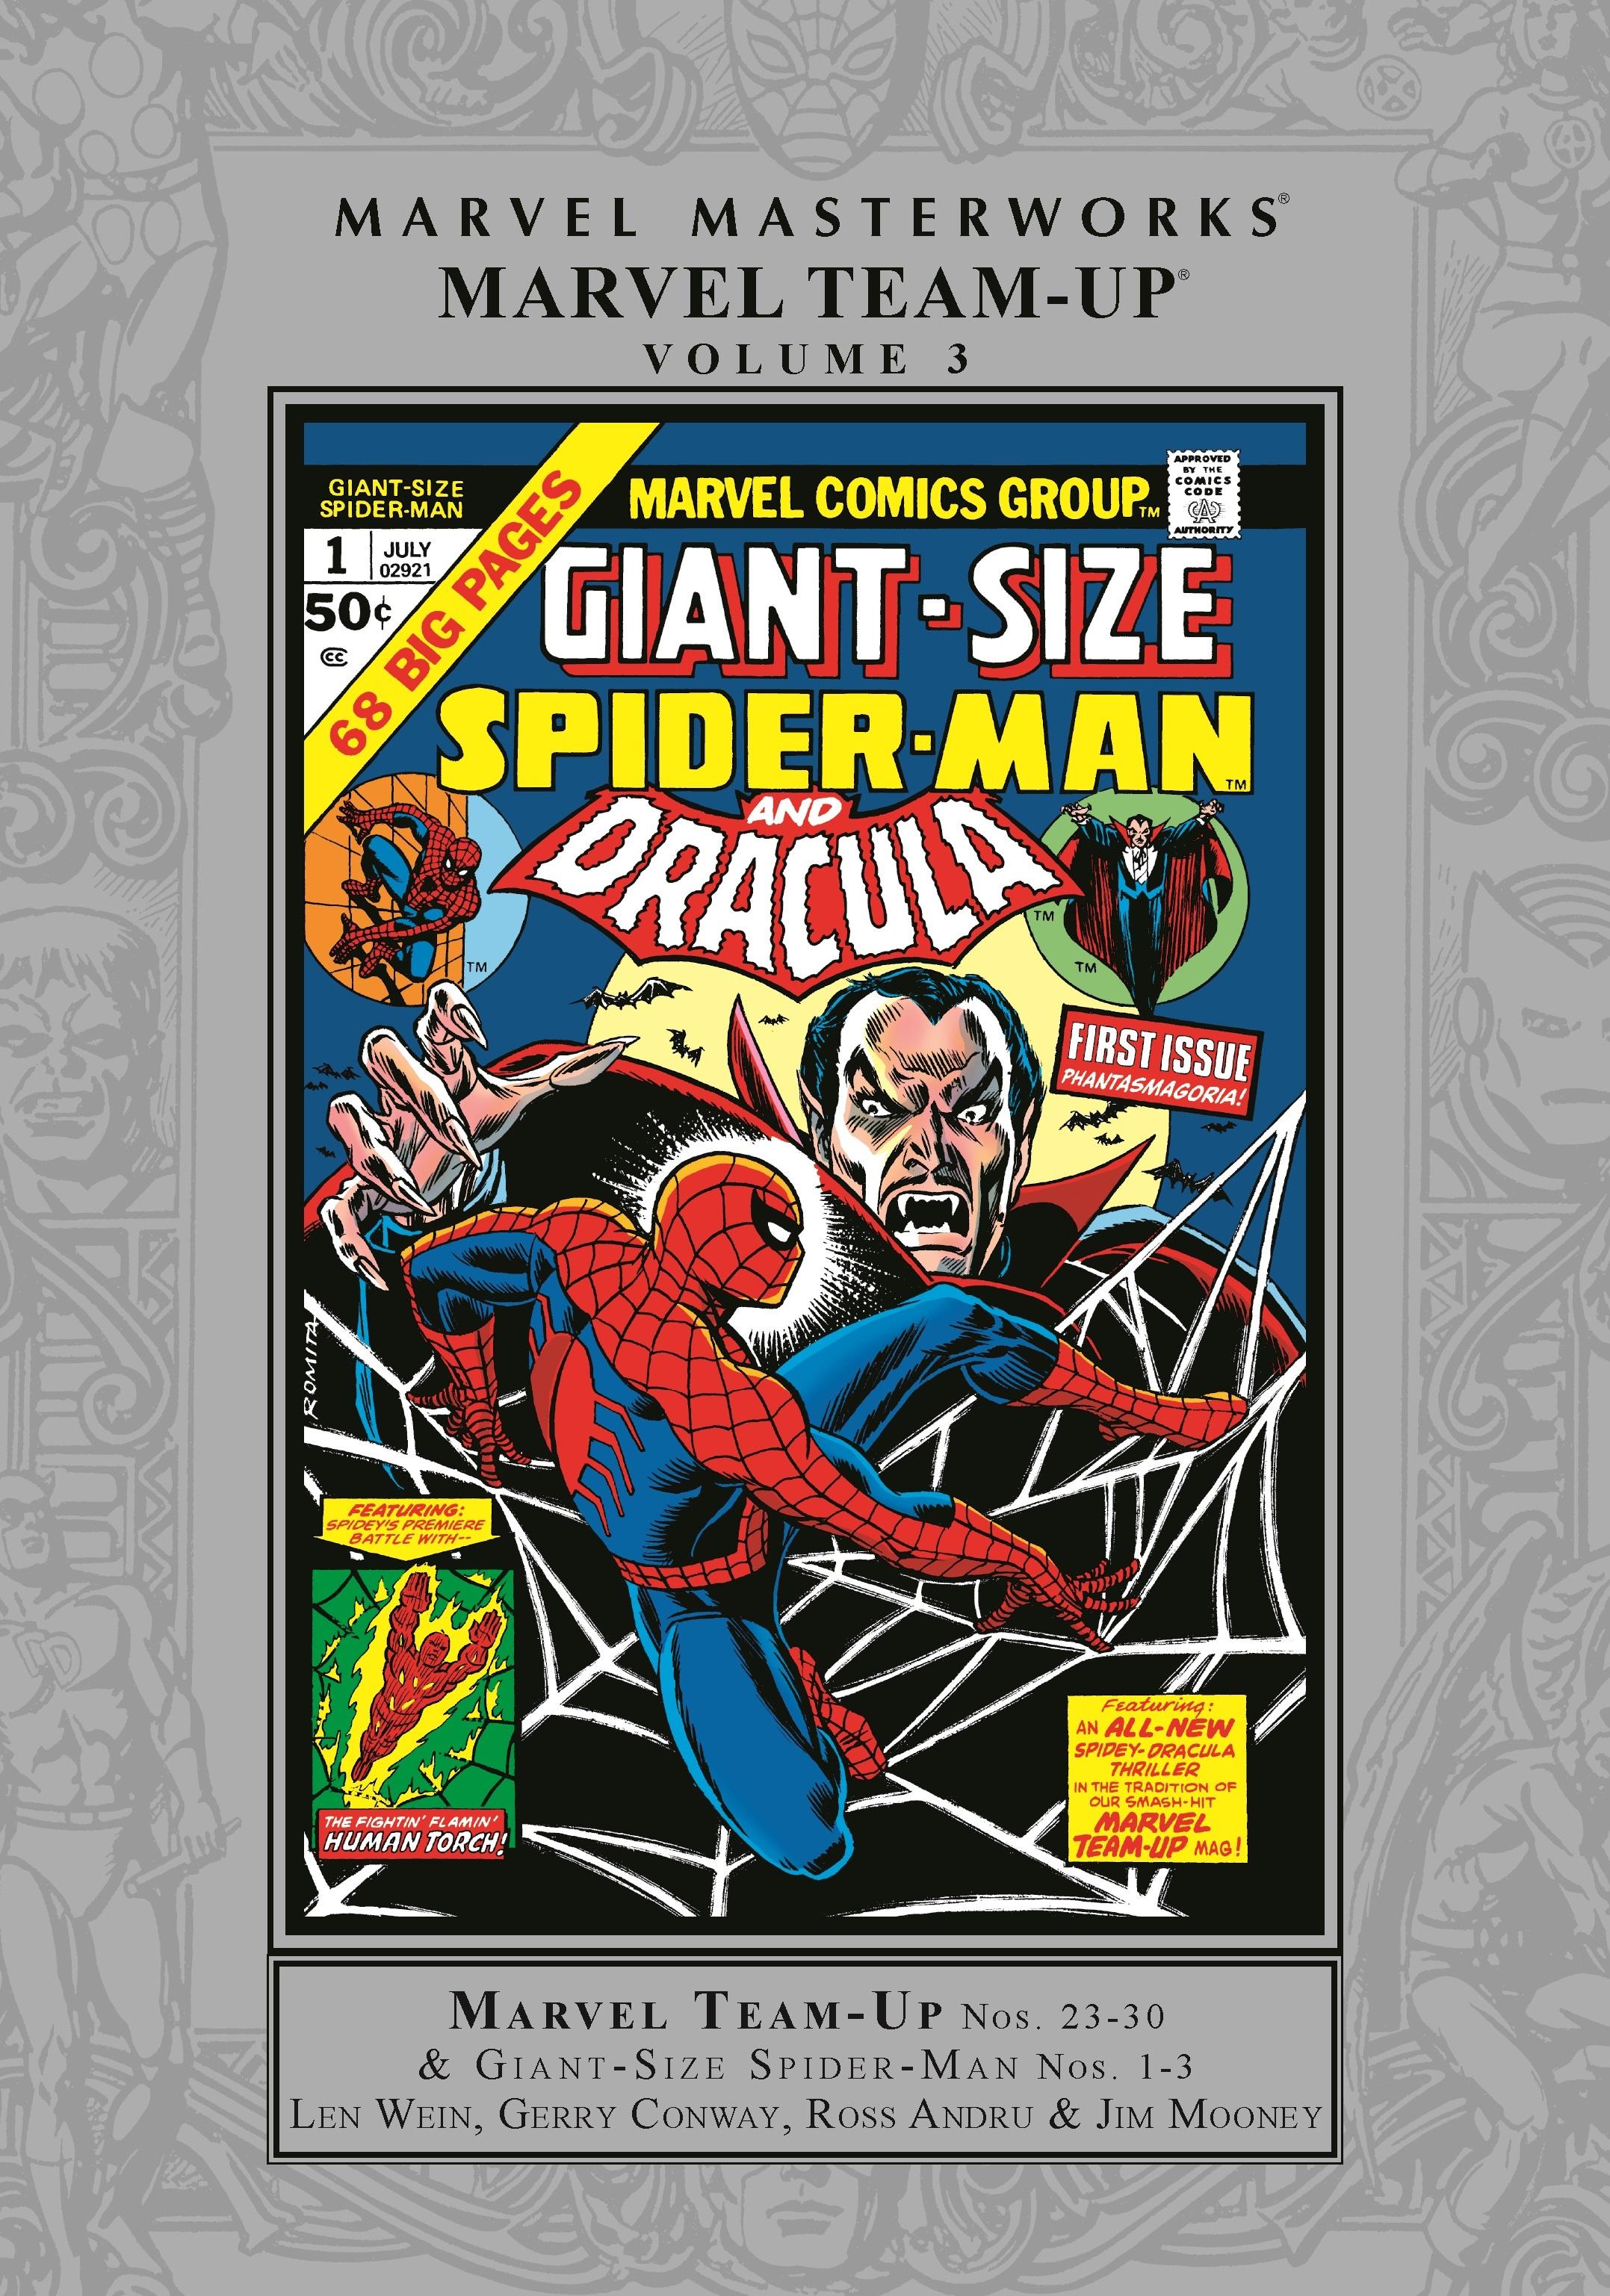 Marvel Masterworks: Marvel Team-Up Vol. 3 (Hardcover)